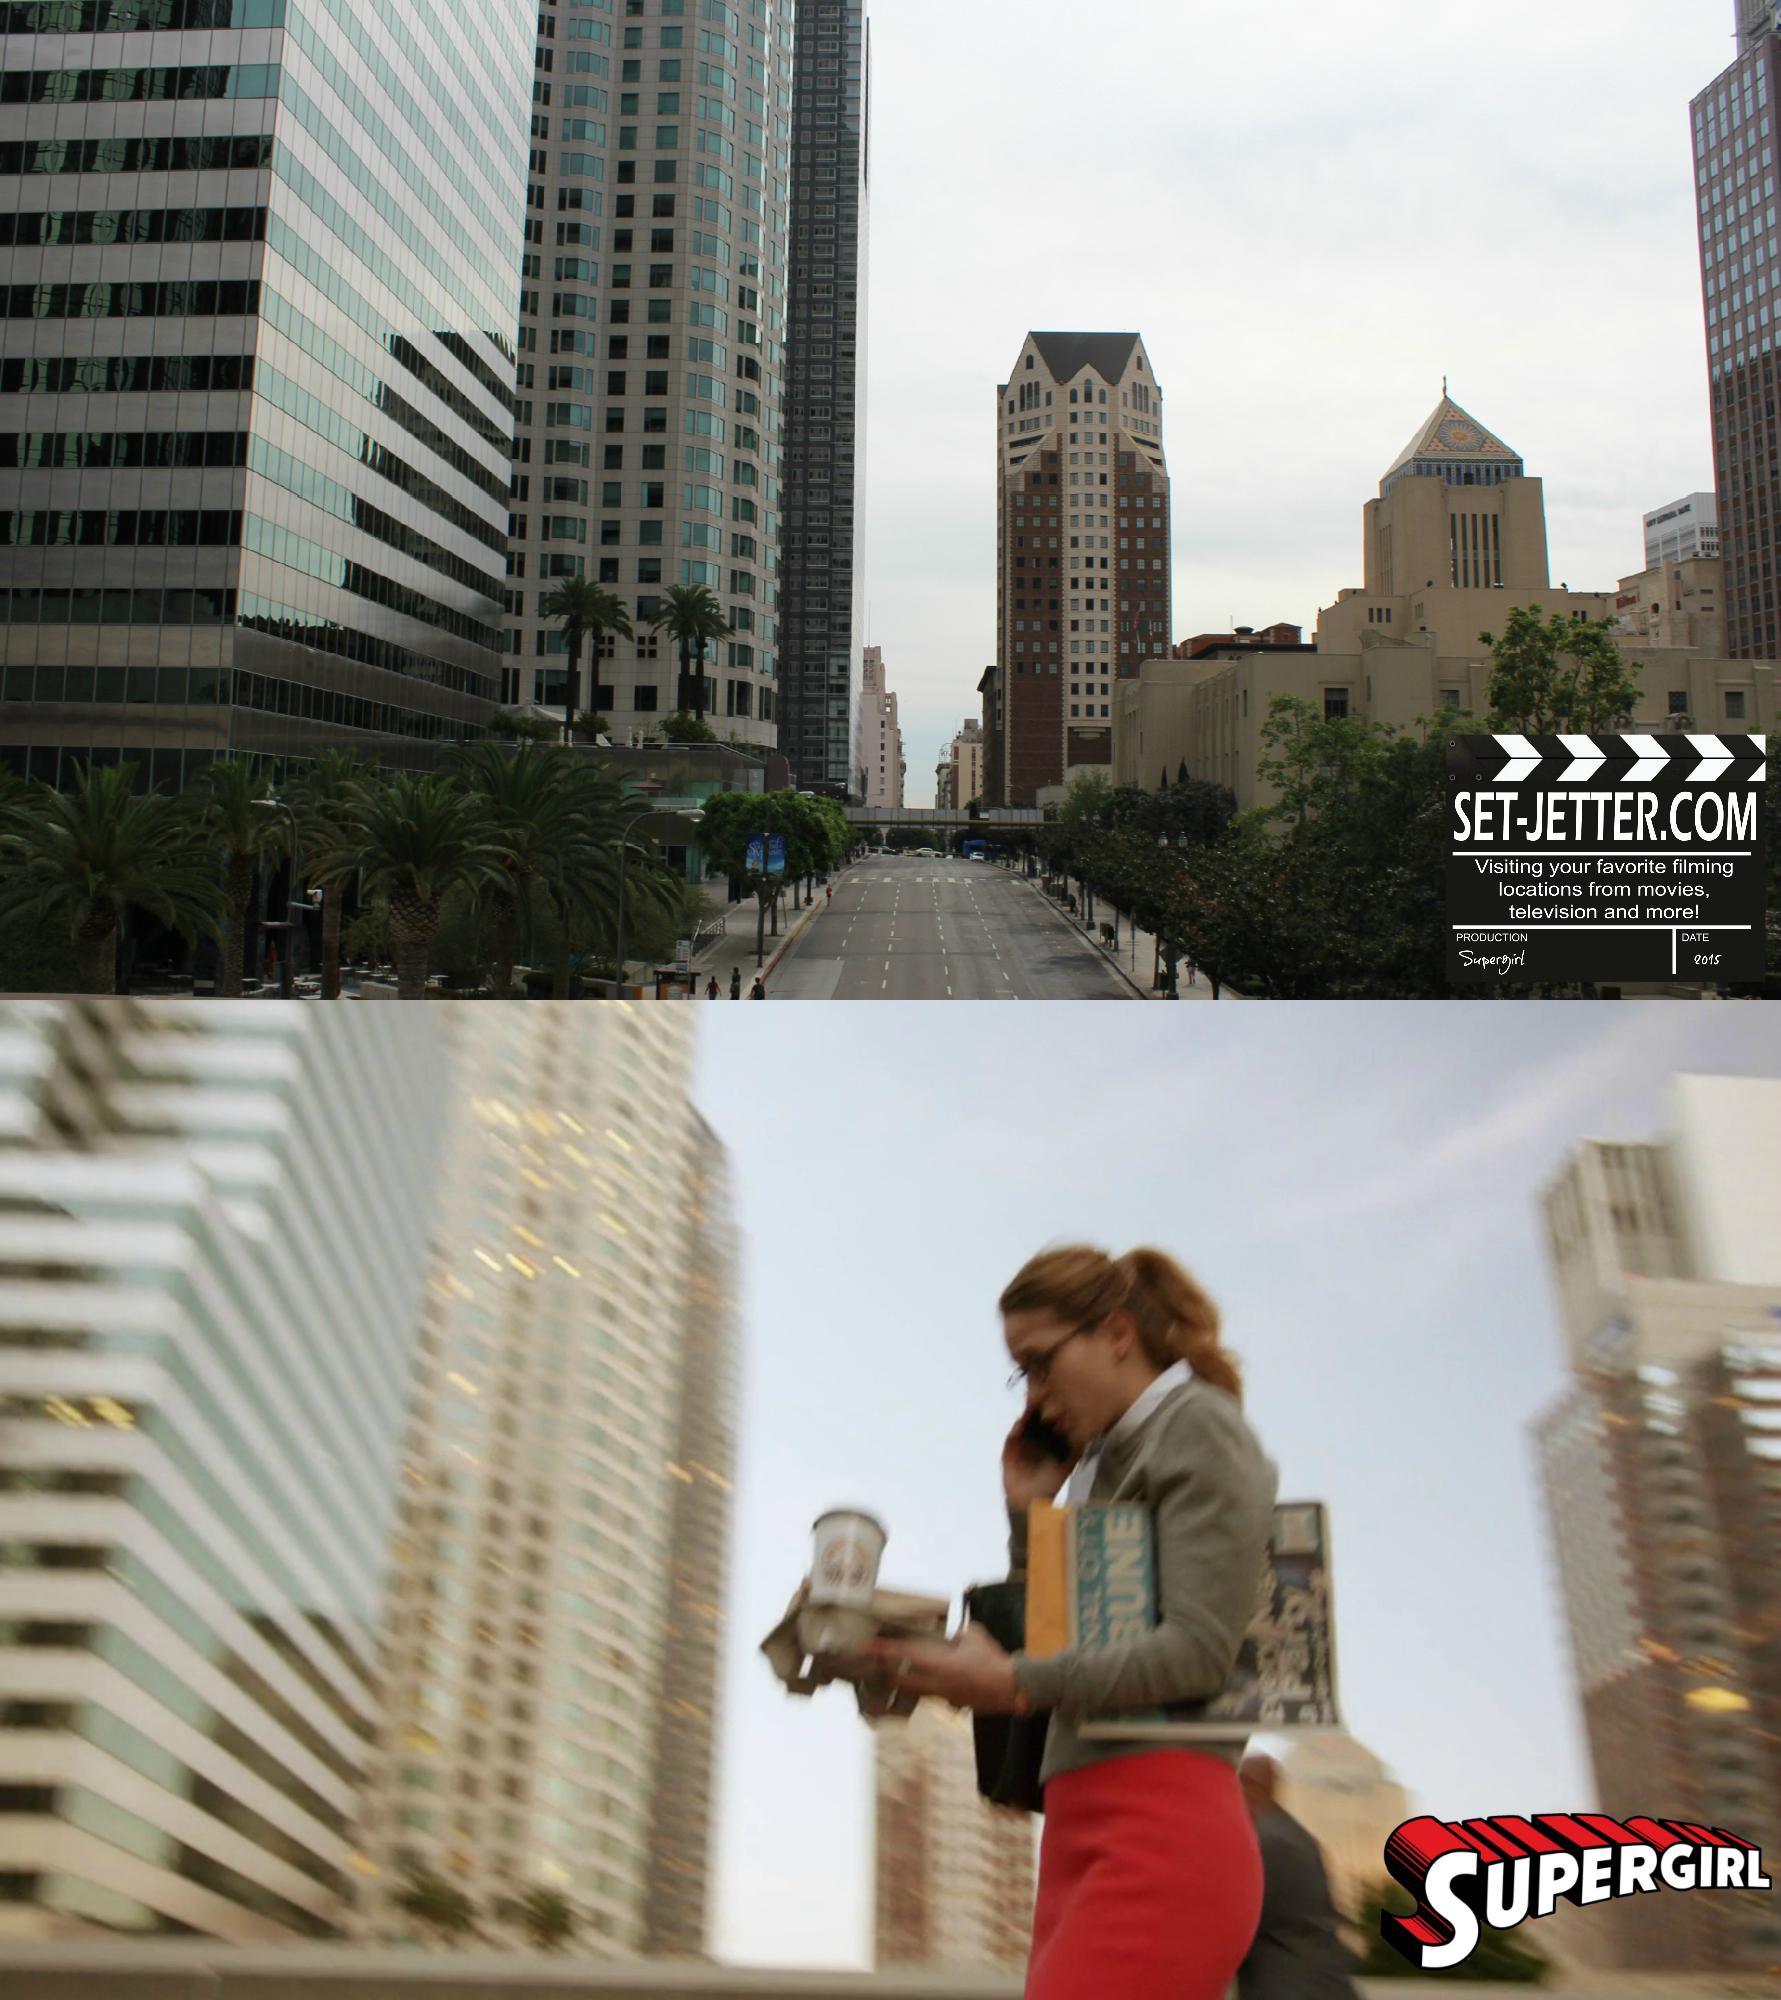 Supergirl comparison 10.jpg